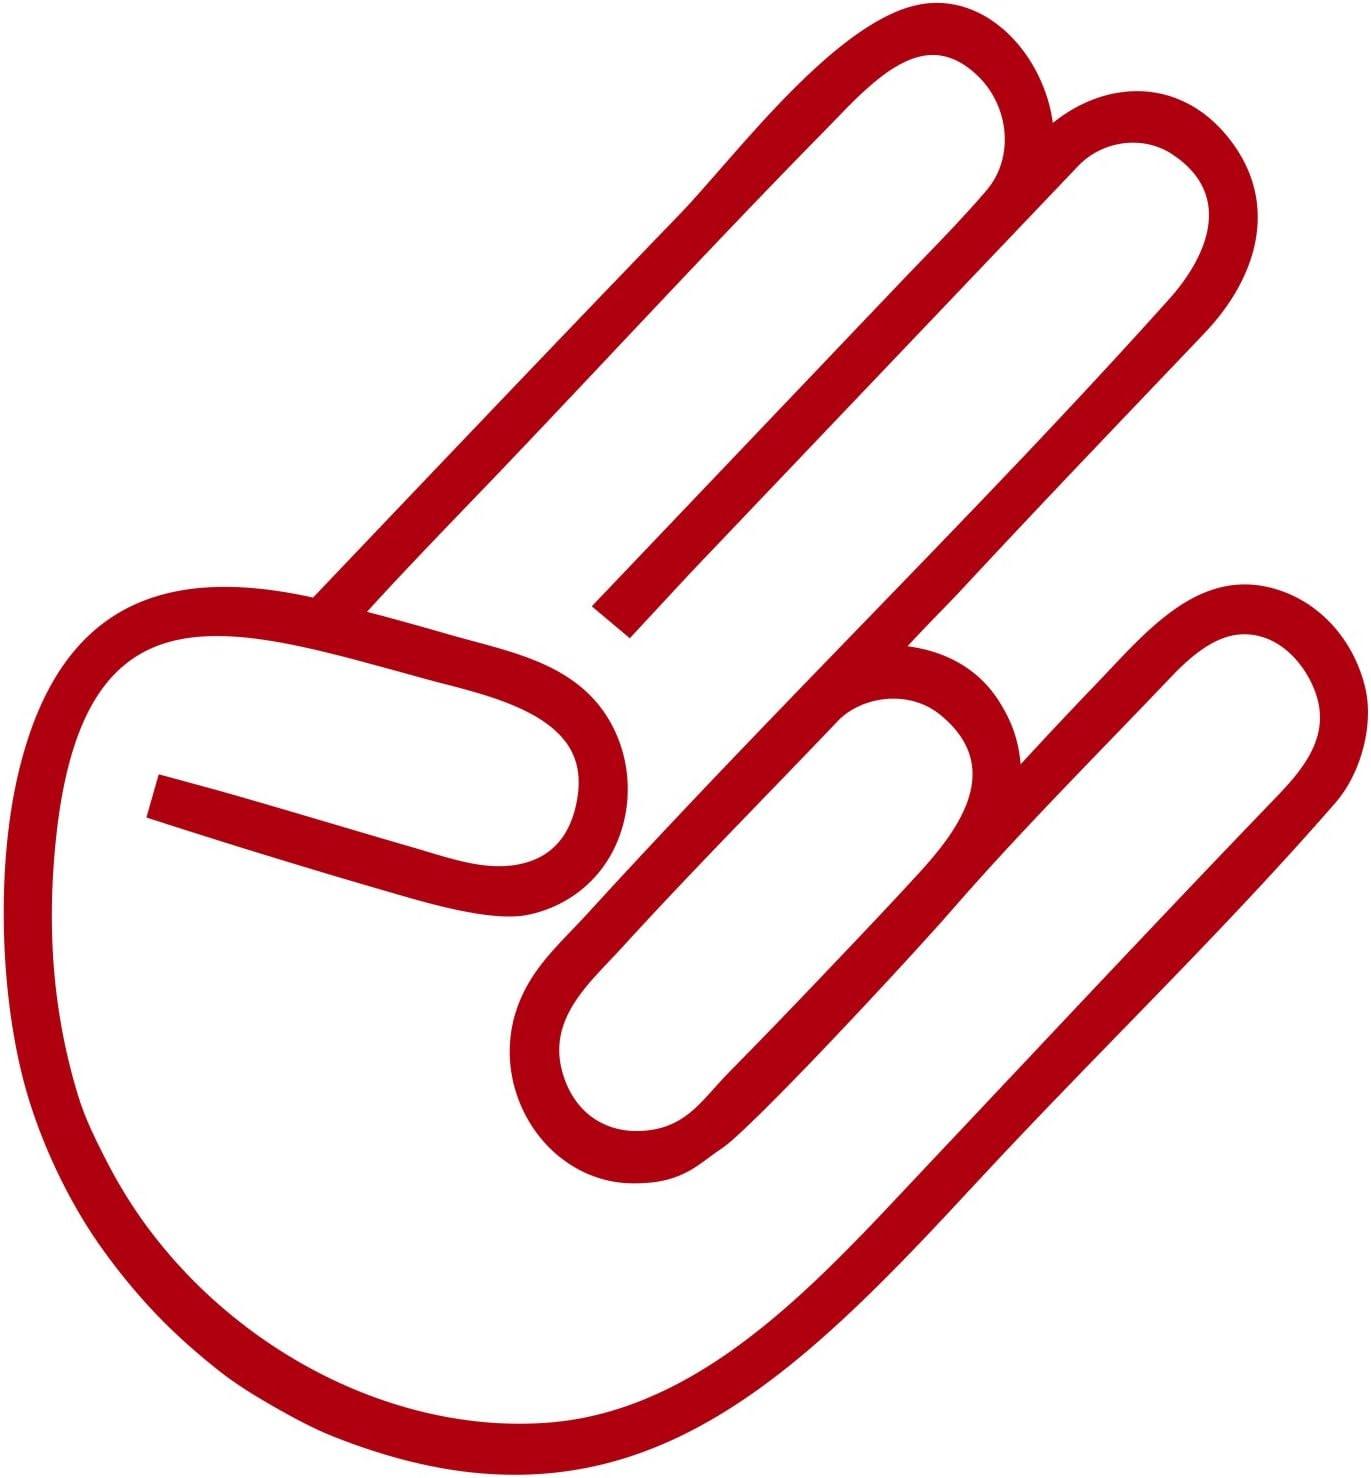 The Shocker Hand Aufkleber Jdm Sticker Dub Kult Oem Autoaufkleber Rot Auto